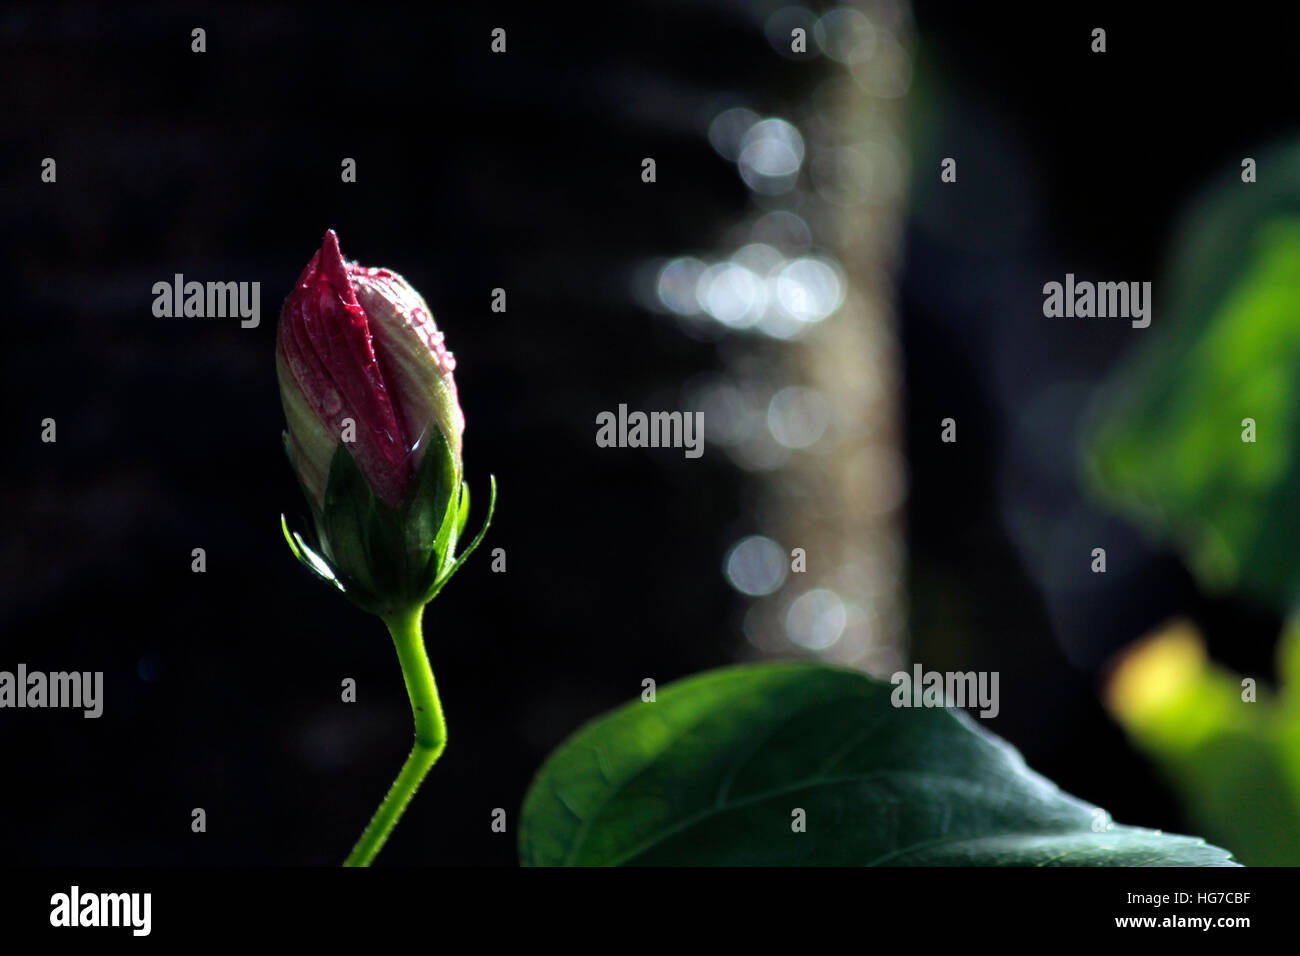 Hibiscus bud bloom stock photos hibiscus bud bloom stock images hibiscus bud stock image izmirmasajfo